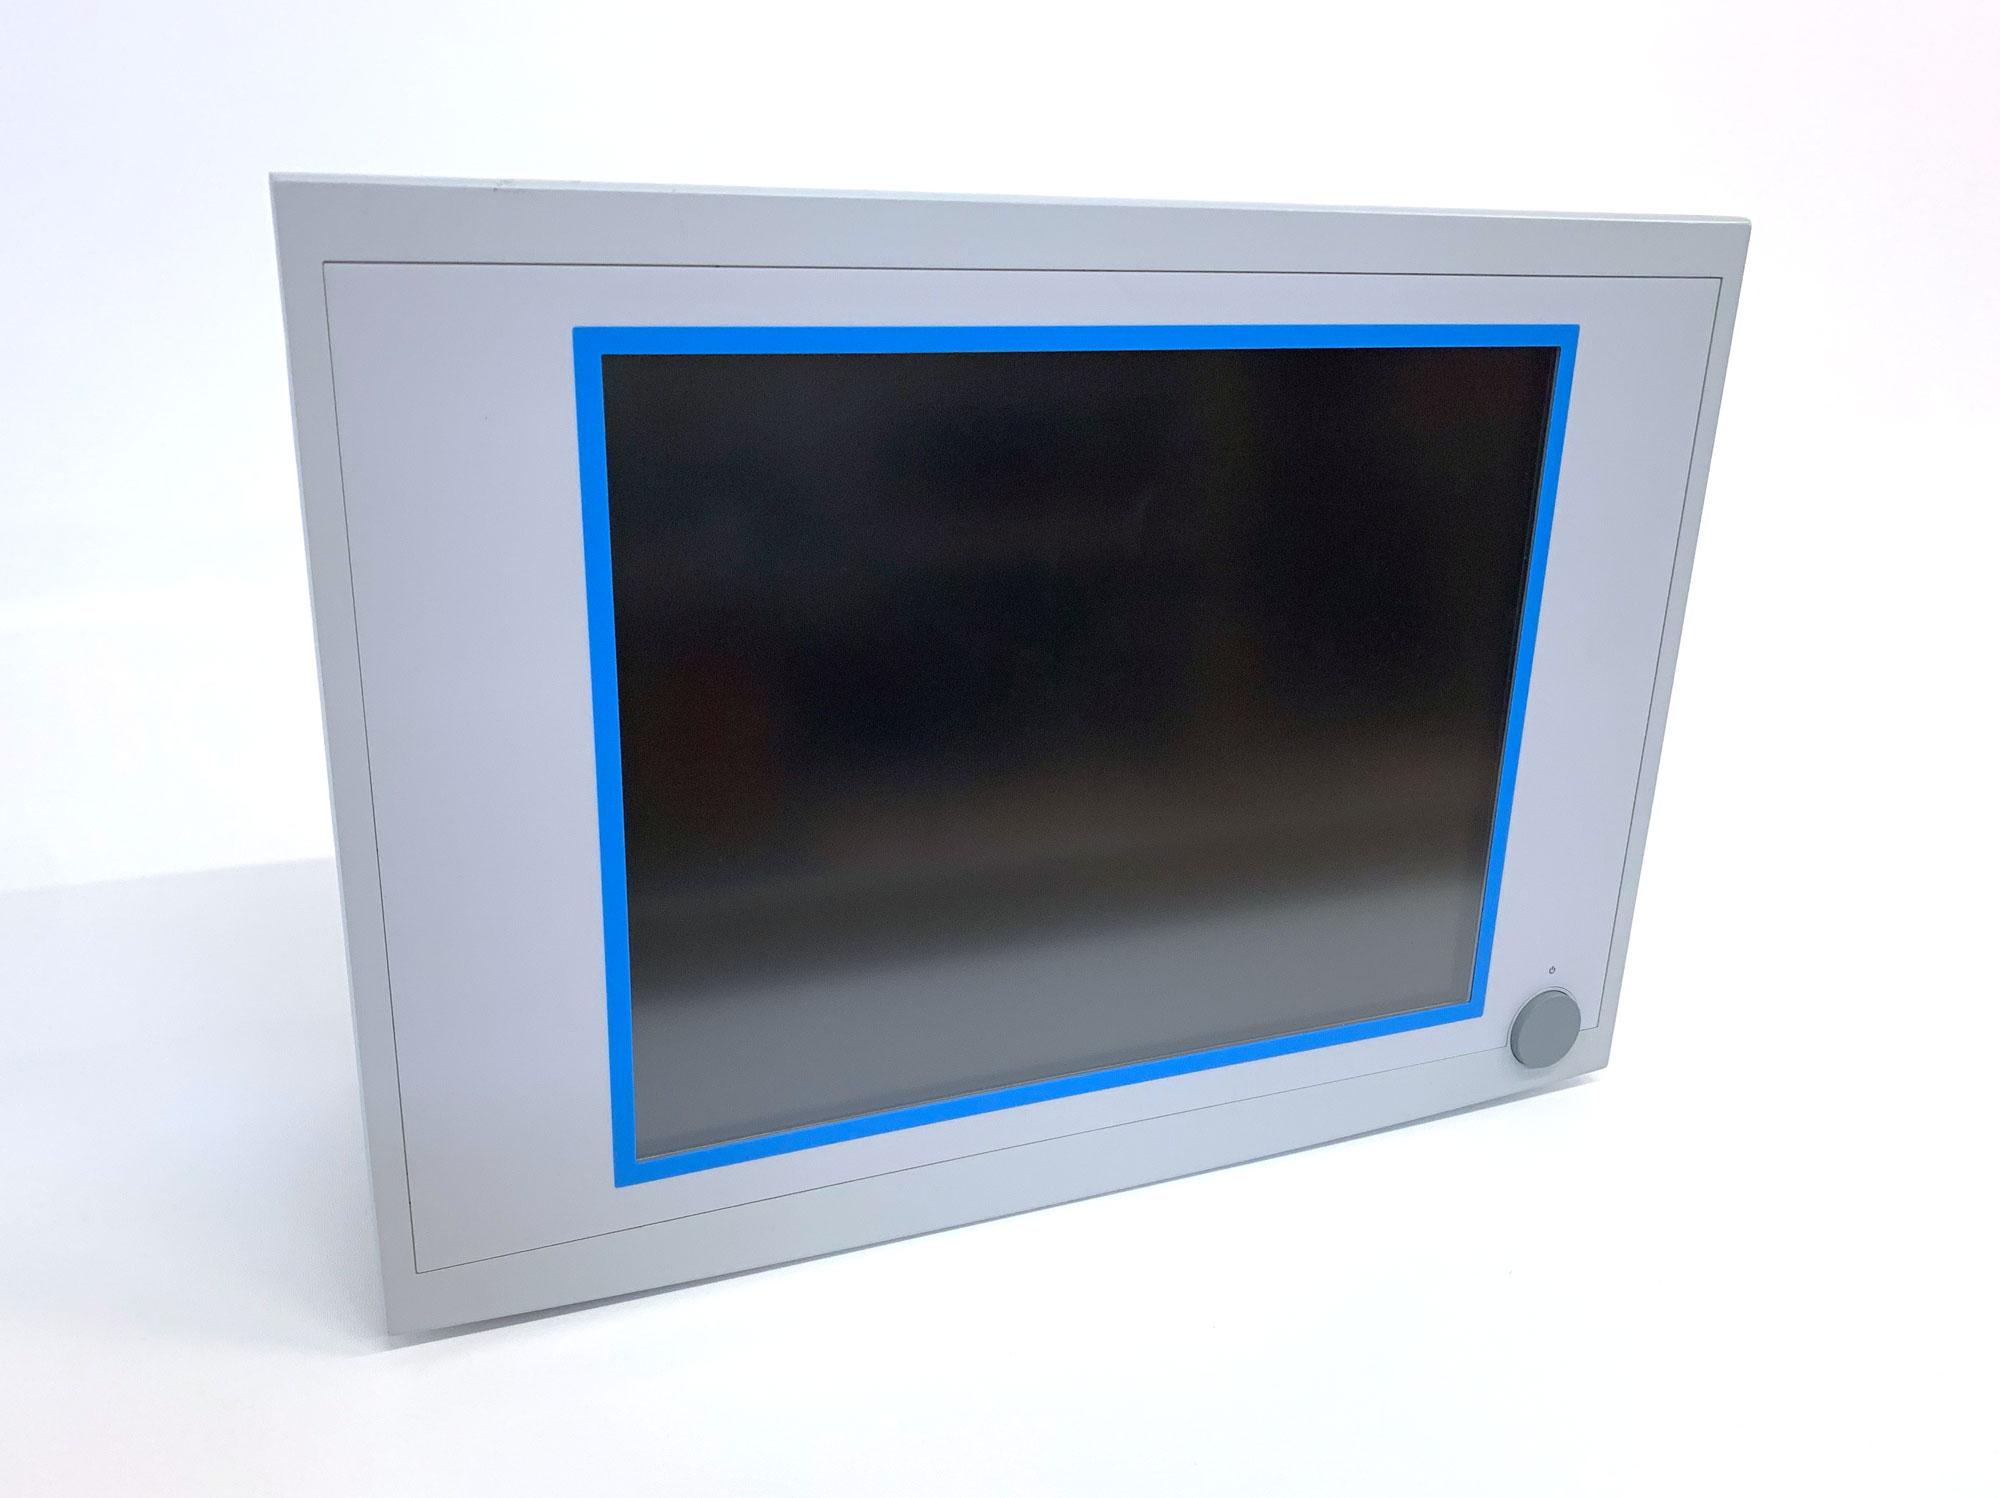 IPPC-6152F - Lüfterloser Industrie Panel PC mit 15-Zoll Display